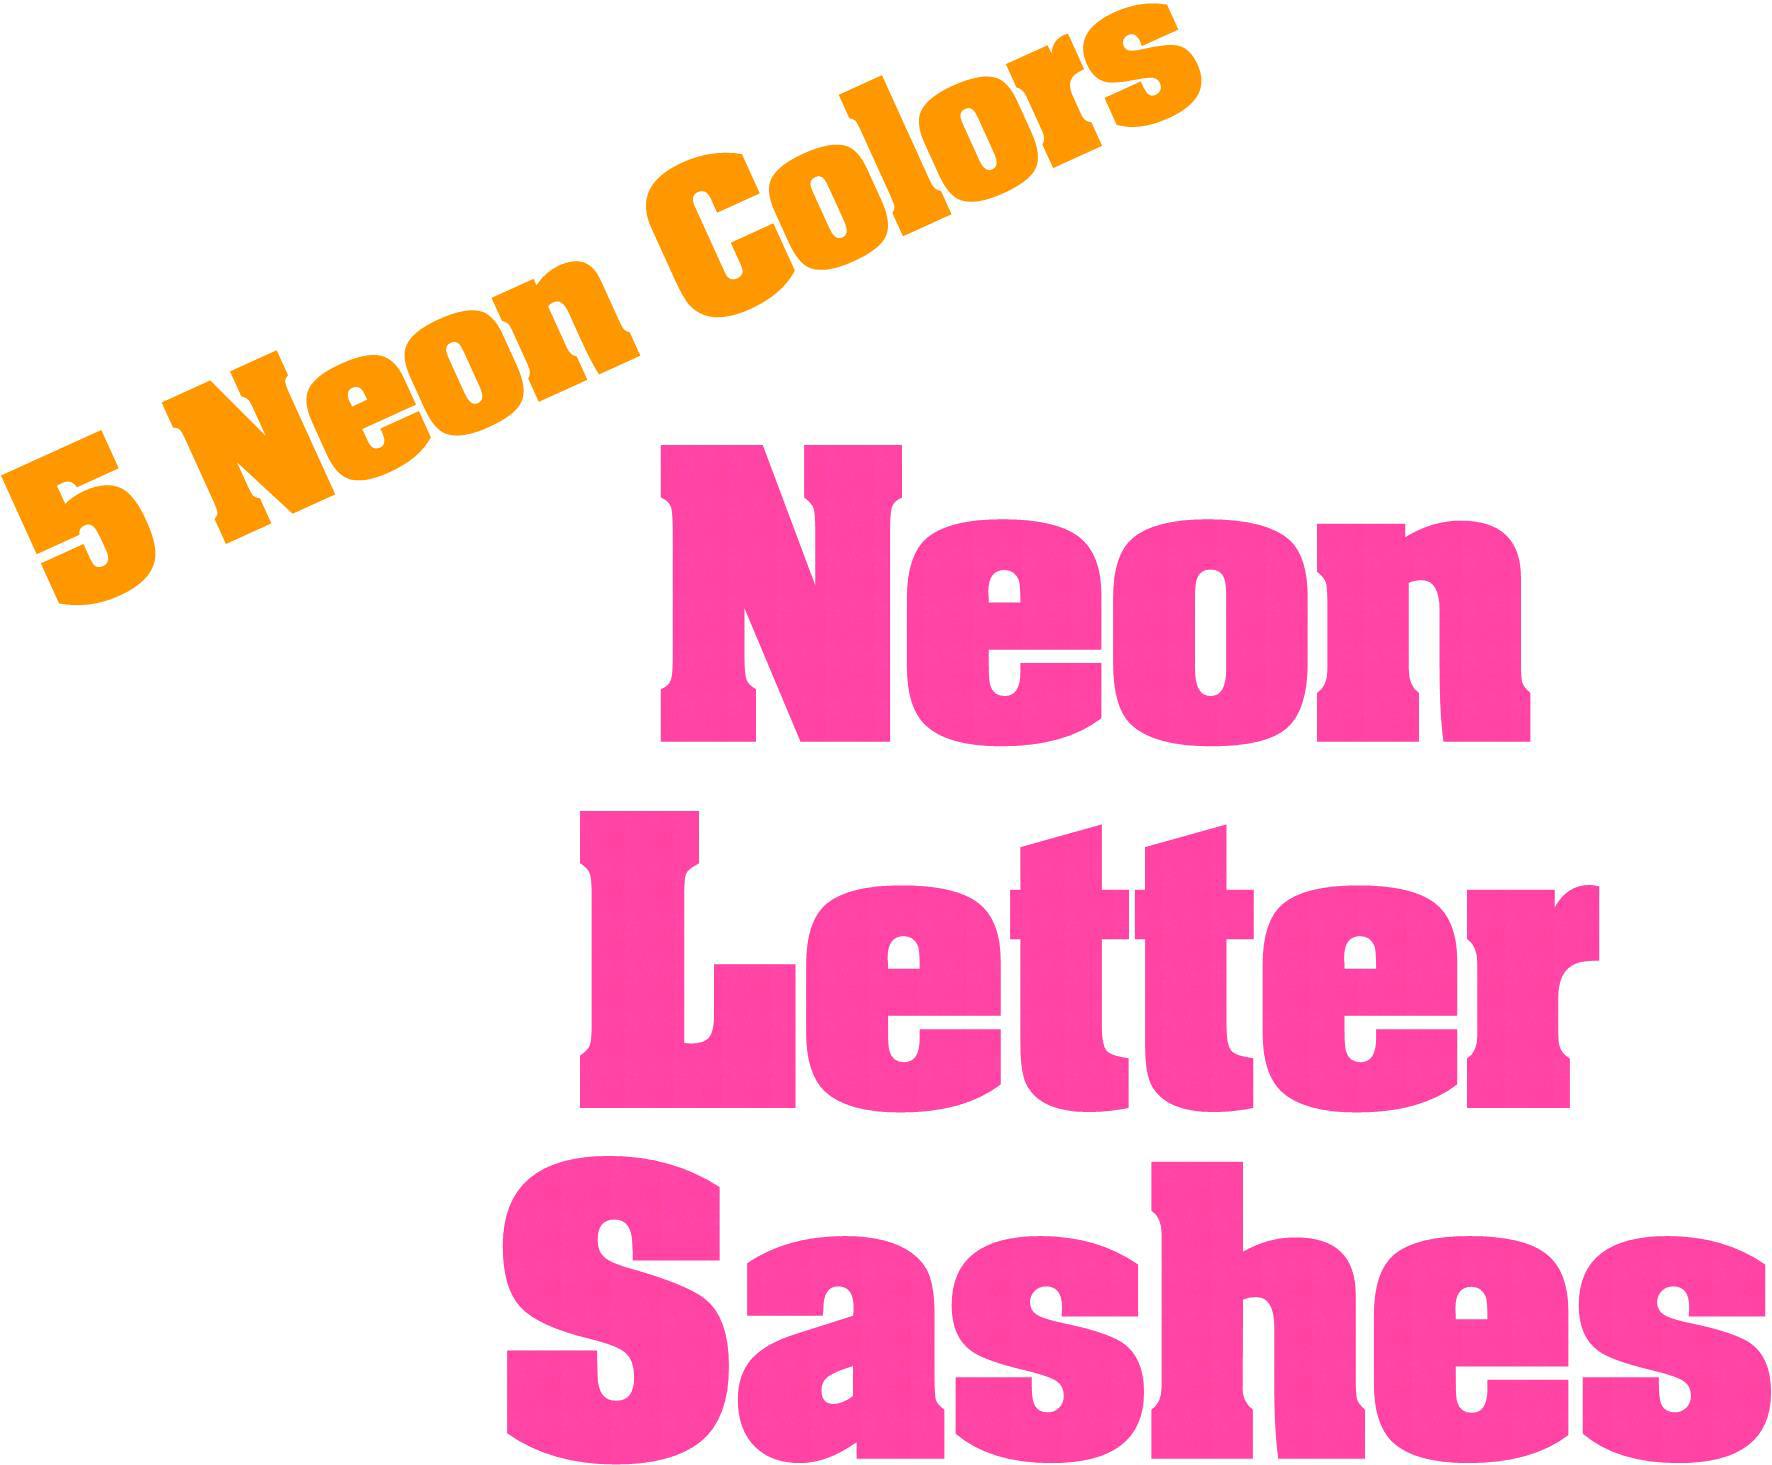 neon1.jpeg